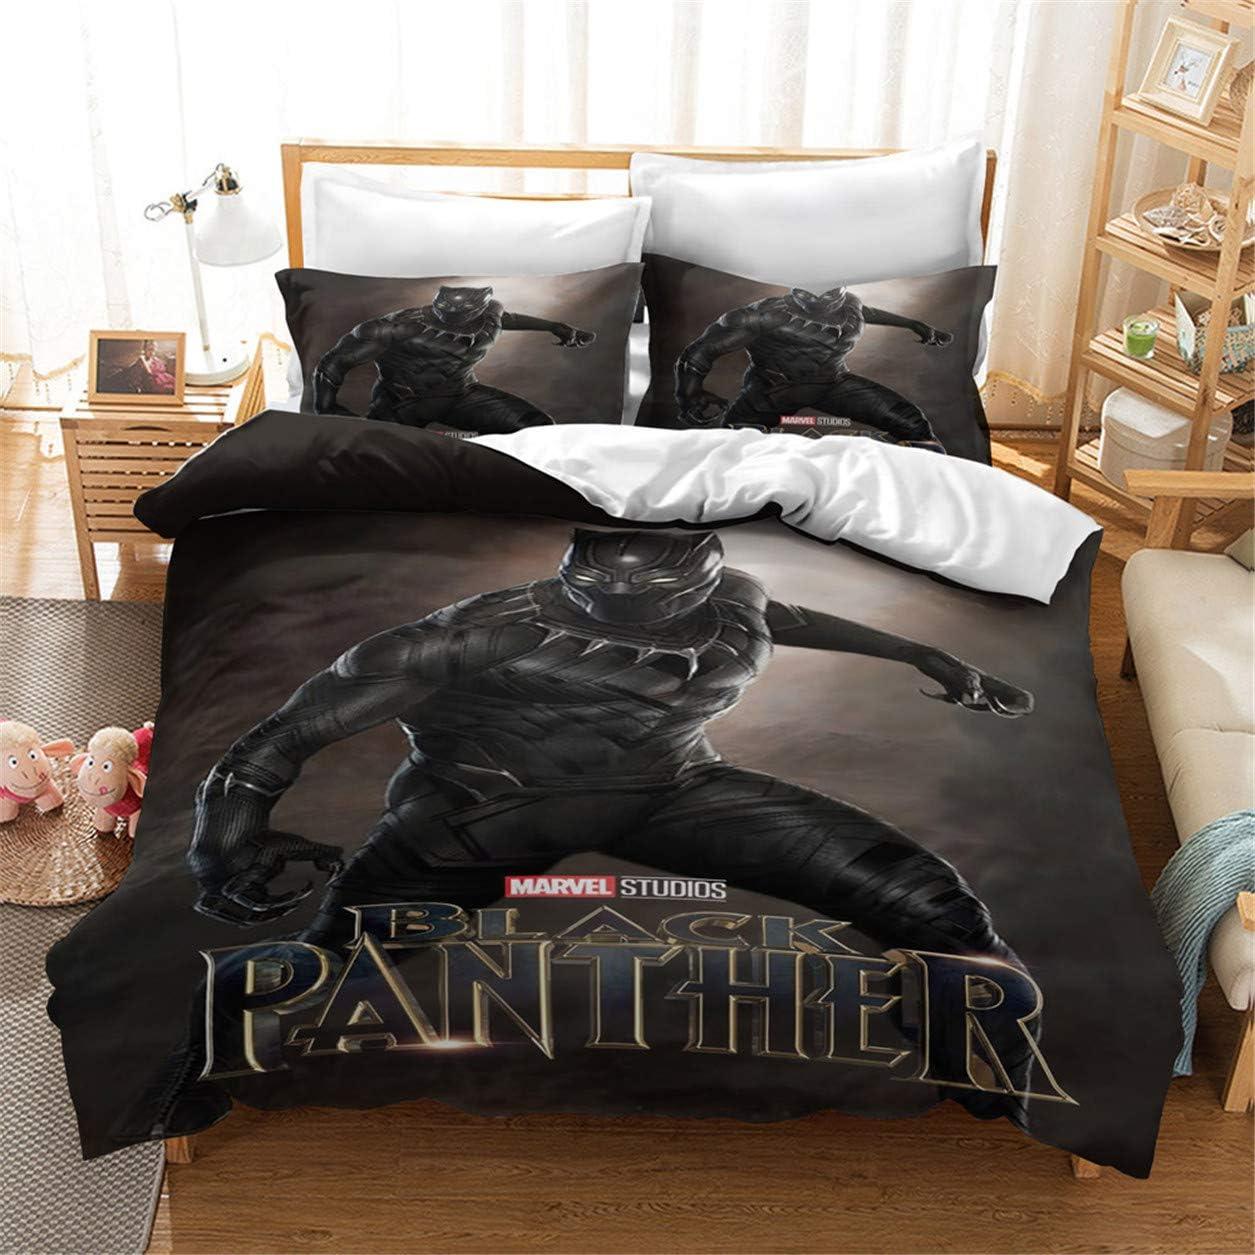 HMT NF 3D Black Panther Bedding Set Marvel Series of Superhero Duvet Cover Set for Kids Science Fiction Action Movie 3Piece 1Duvet Cover 1 Pillowcase Twin Size